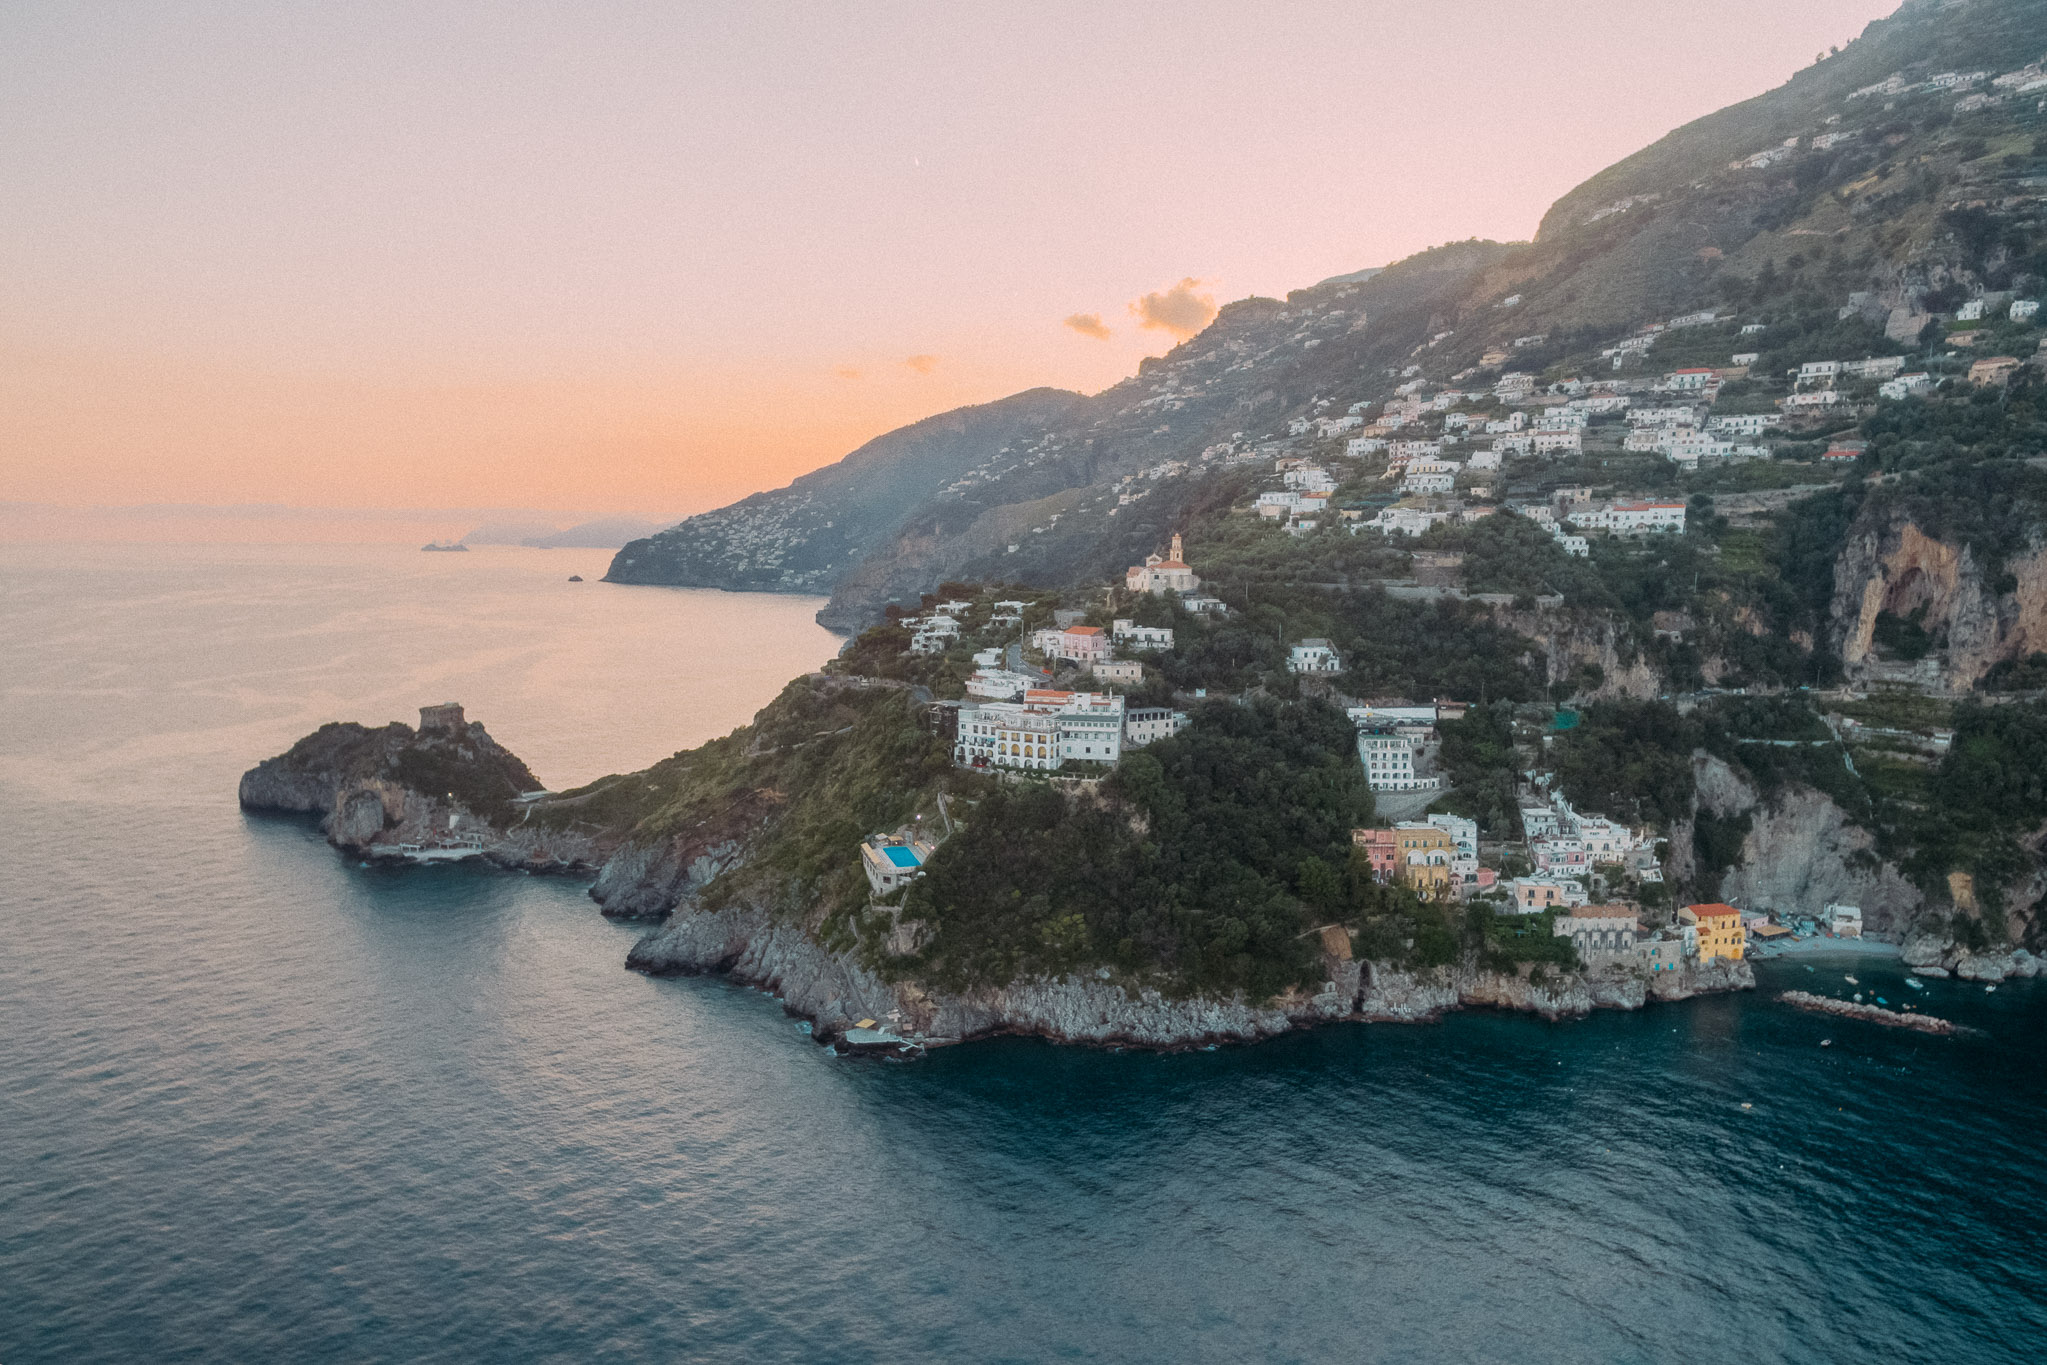 PJ Rankin_Drop in the Ocean_Italy-11.jpg